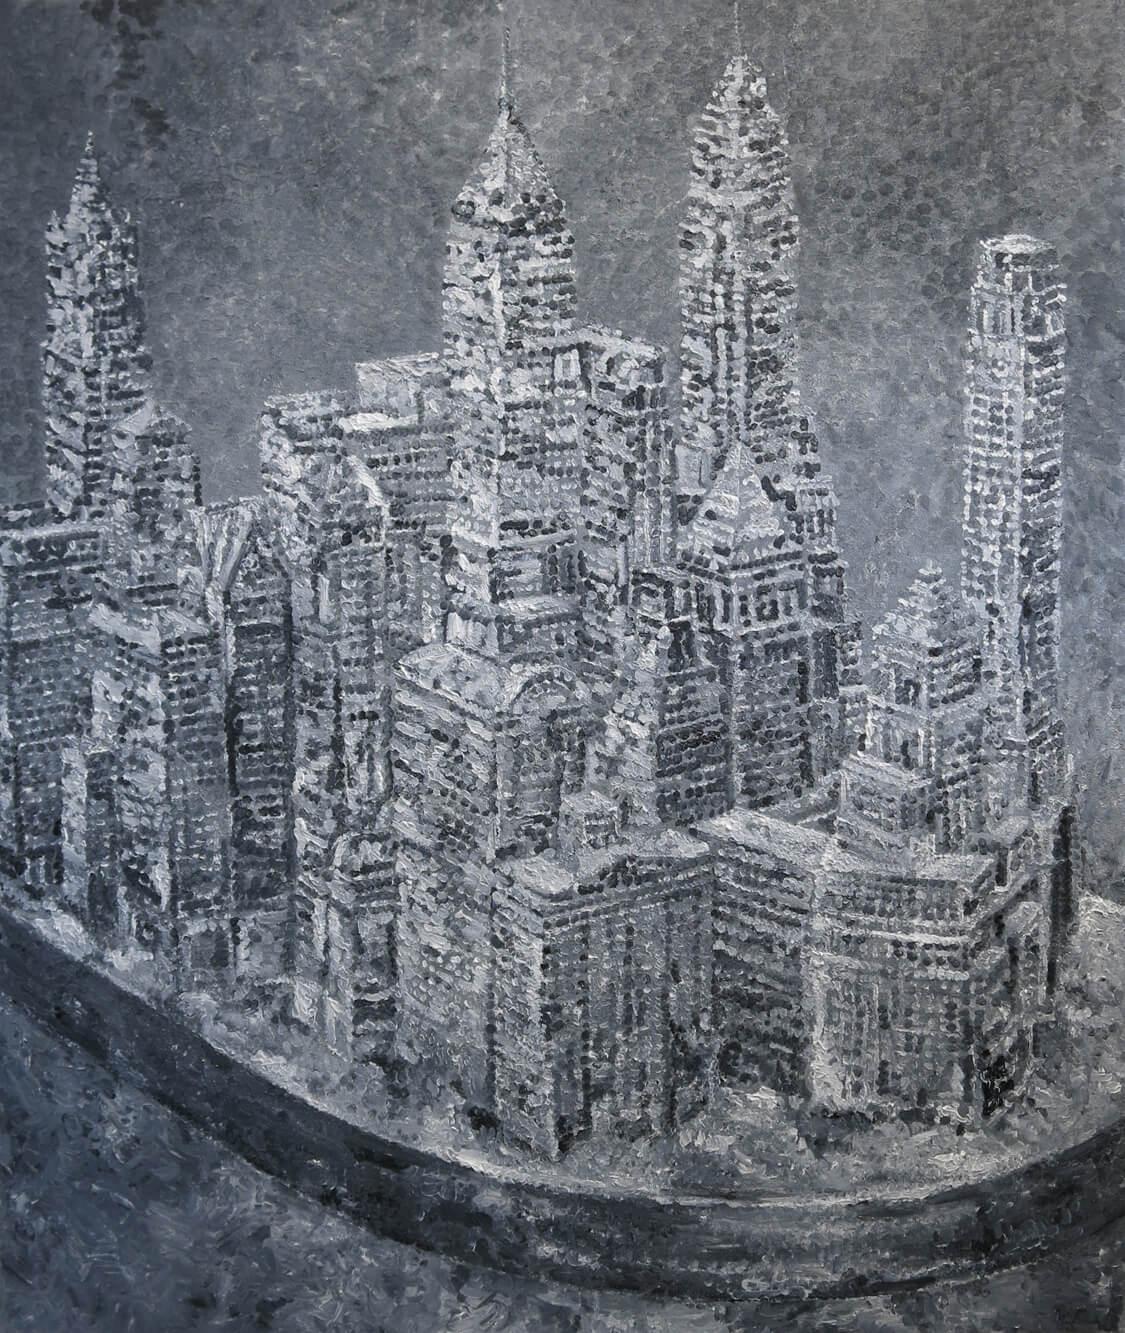 Urban model (Manhattan) - Oil on Canvas, 160 x 130 cm, 2014